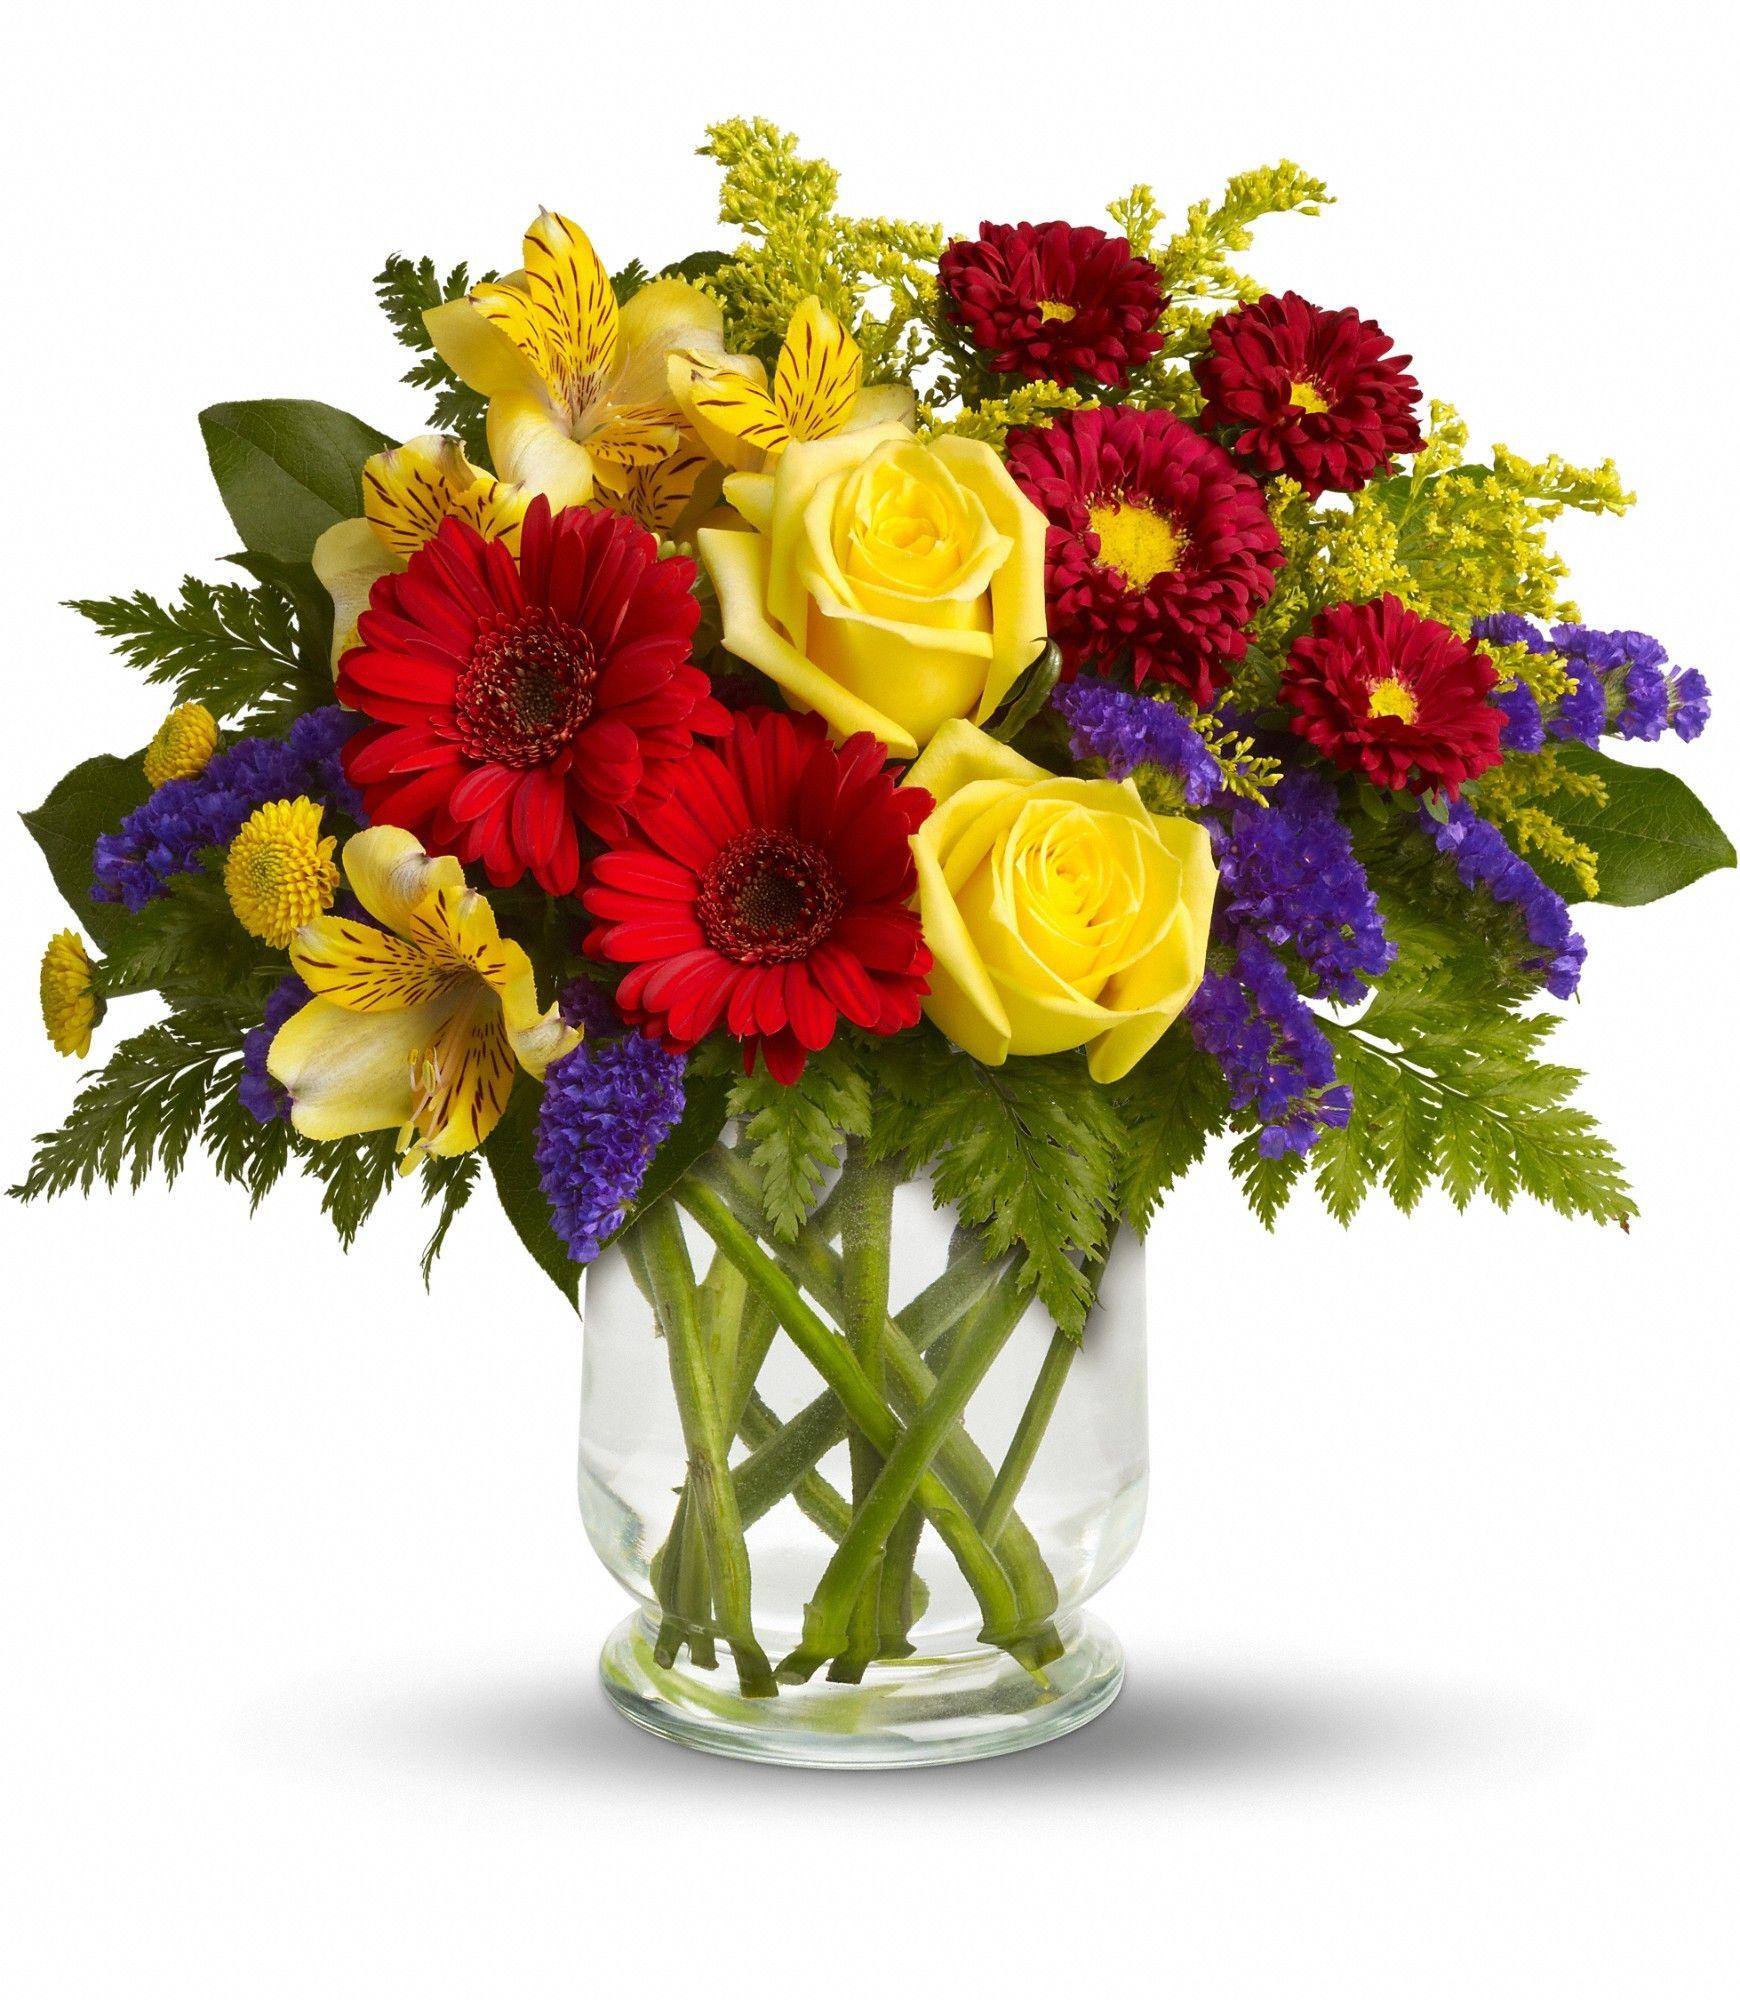 Garden Parade   Bukiety   Pinterest   Florists, Flowers and Buy ...